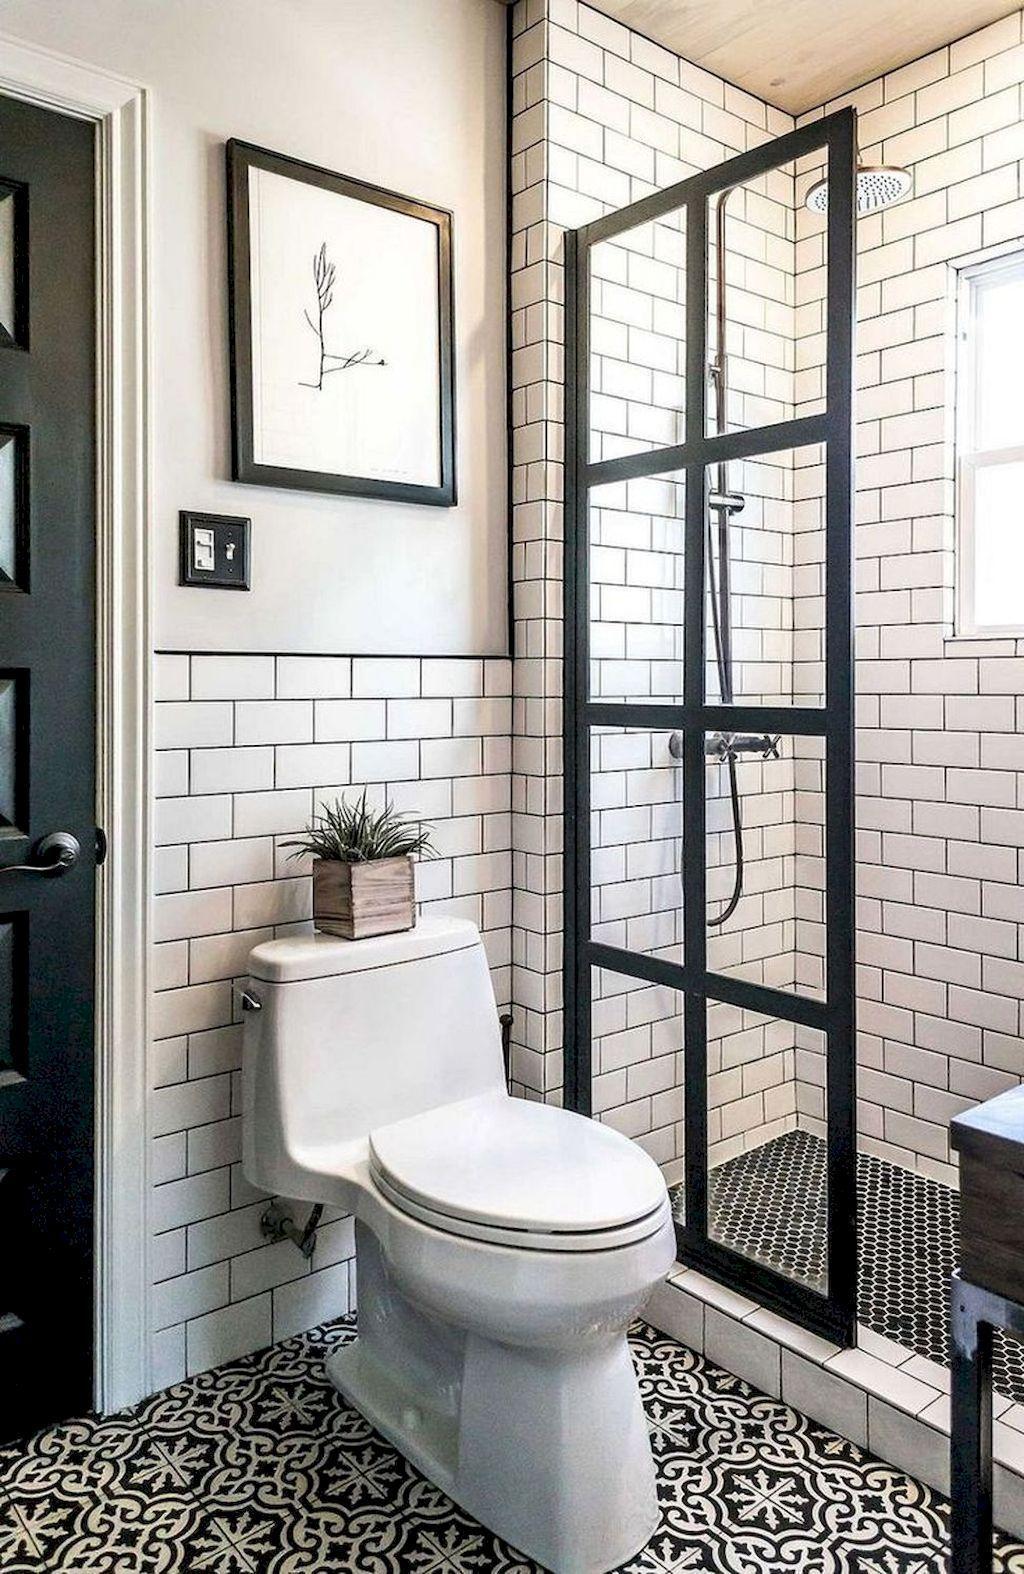 30 Best Small Master Bedroom Remodel Ideas Bathroom Design Small Bathroom Remodel Master Small Bathroom